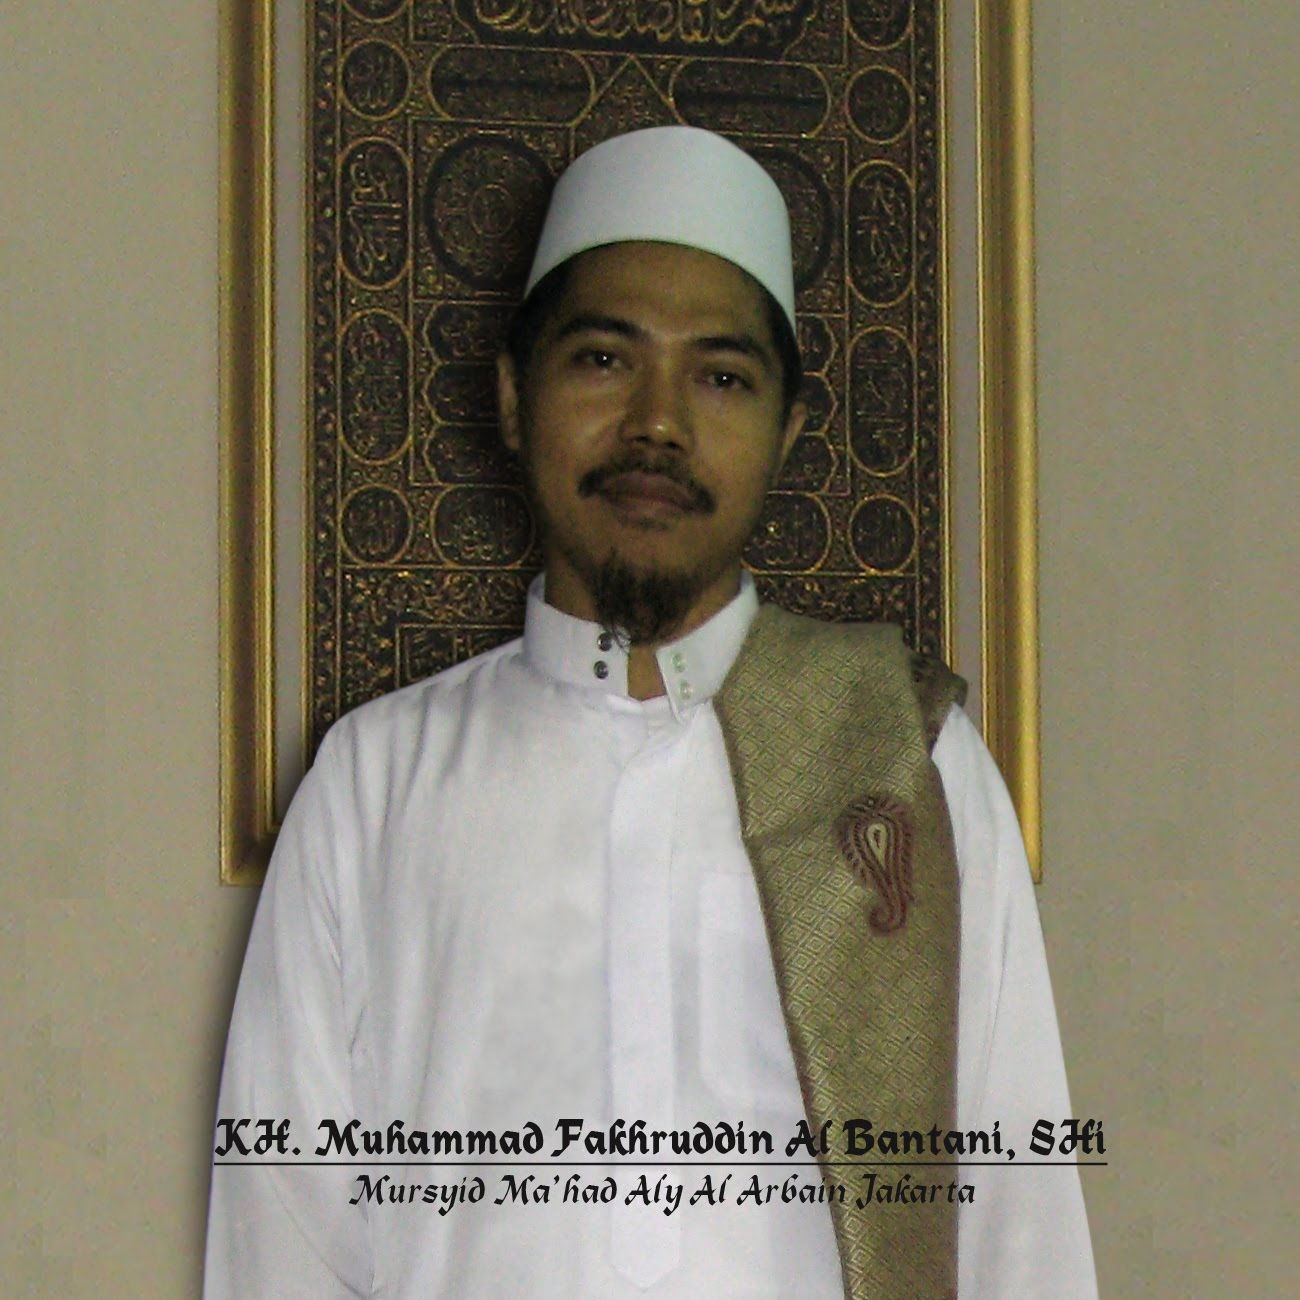 KH Muhammad Fakhruddin Al Bantani, SHi